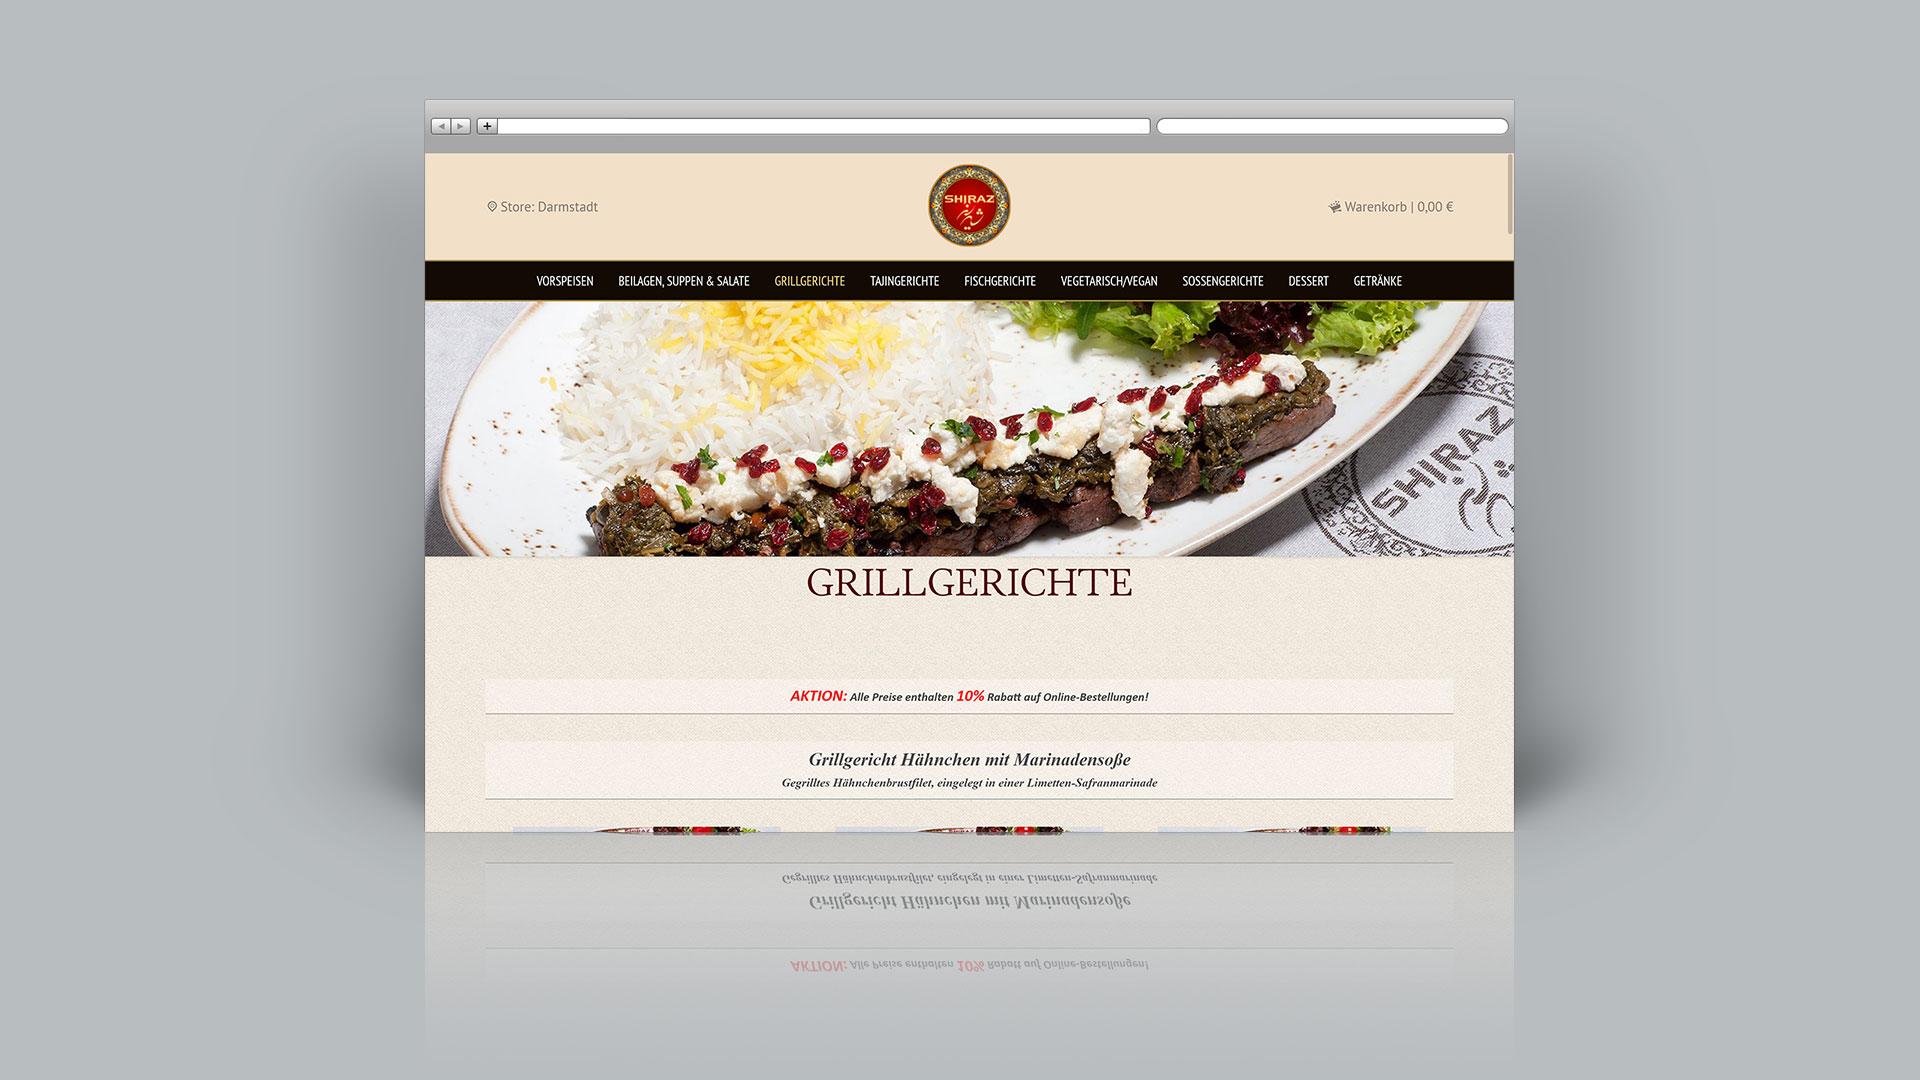 Shiraz Restaurant Darmstadt